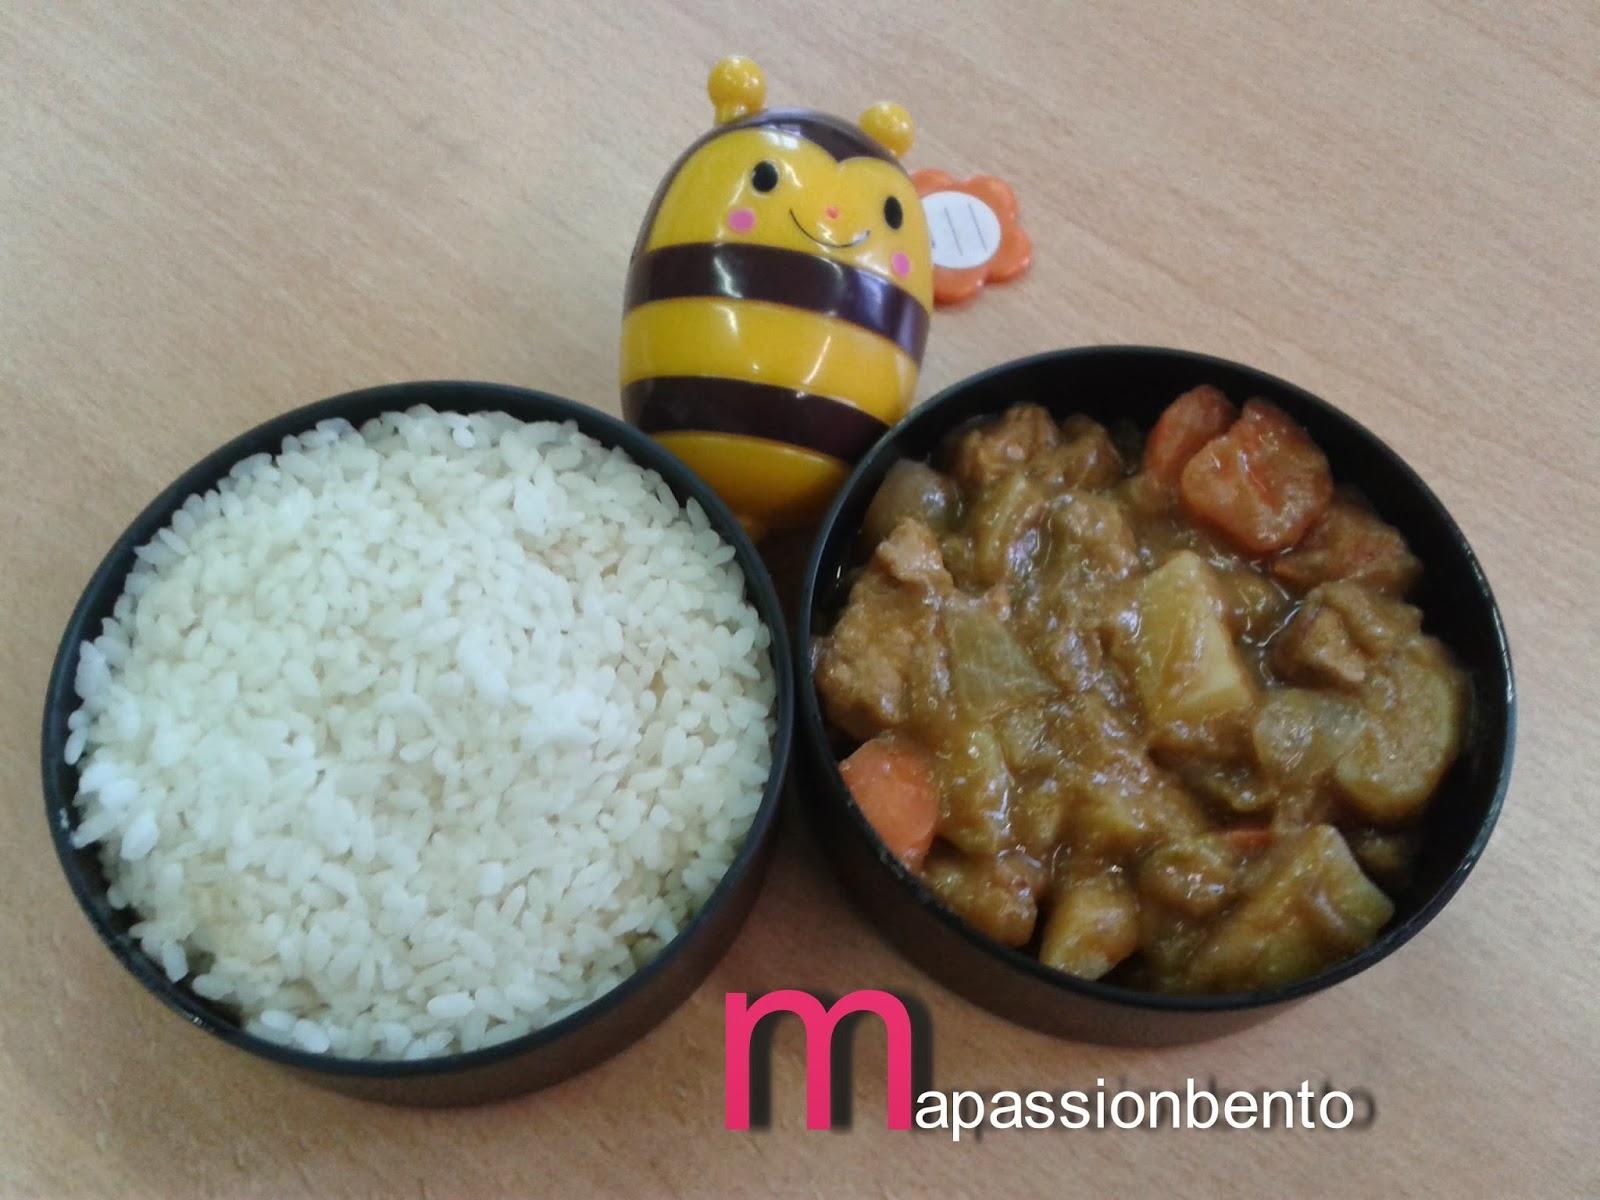 ma passion bento bento curry japonais traditionnel. Black Bedroom Furniture Sets. Home Design Ideas